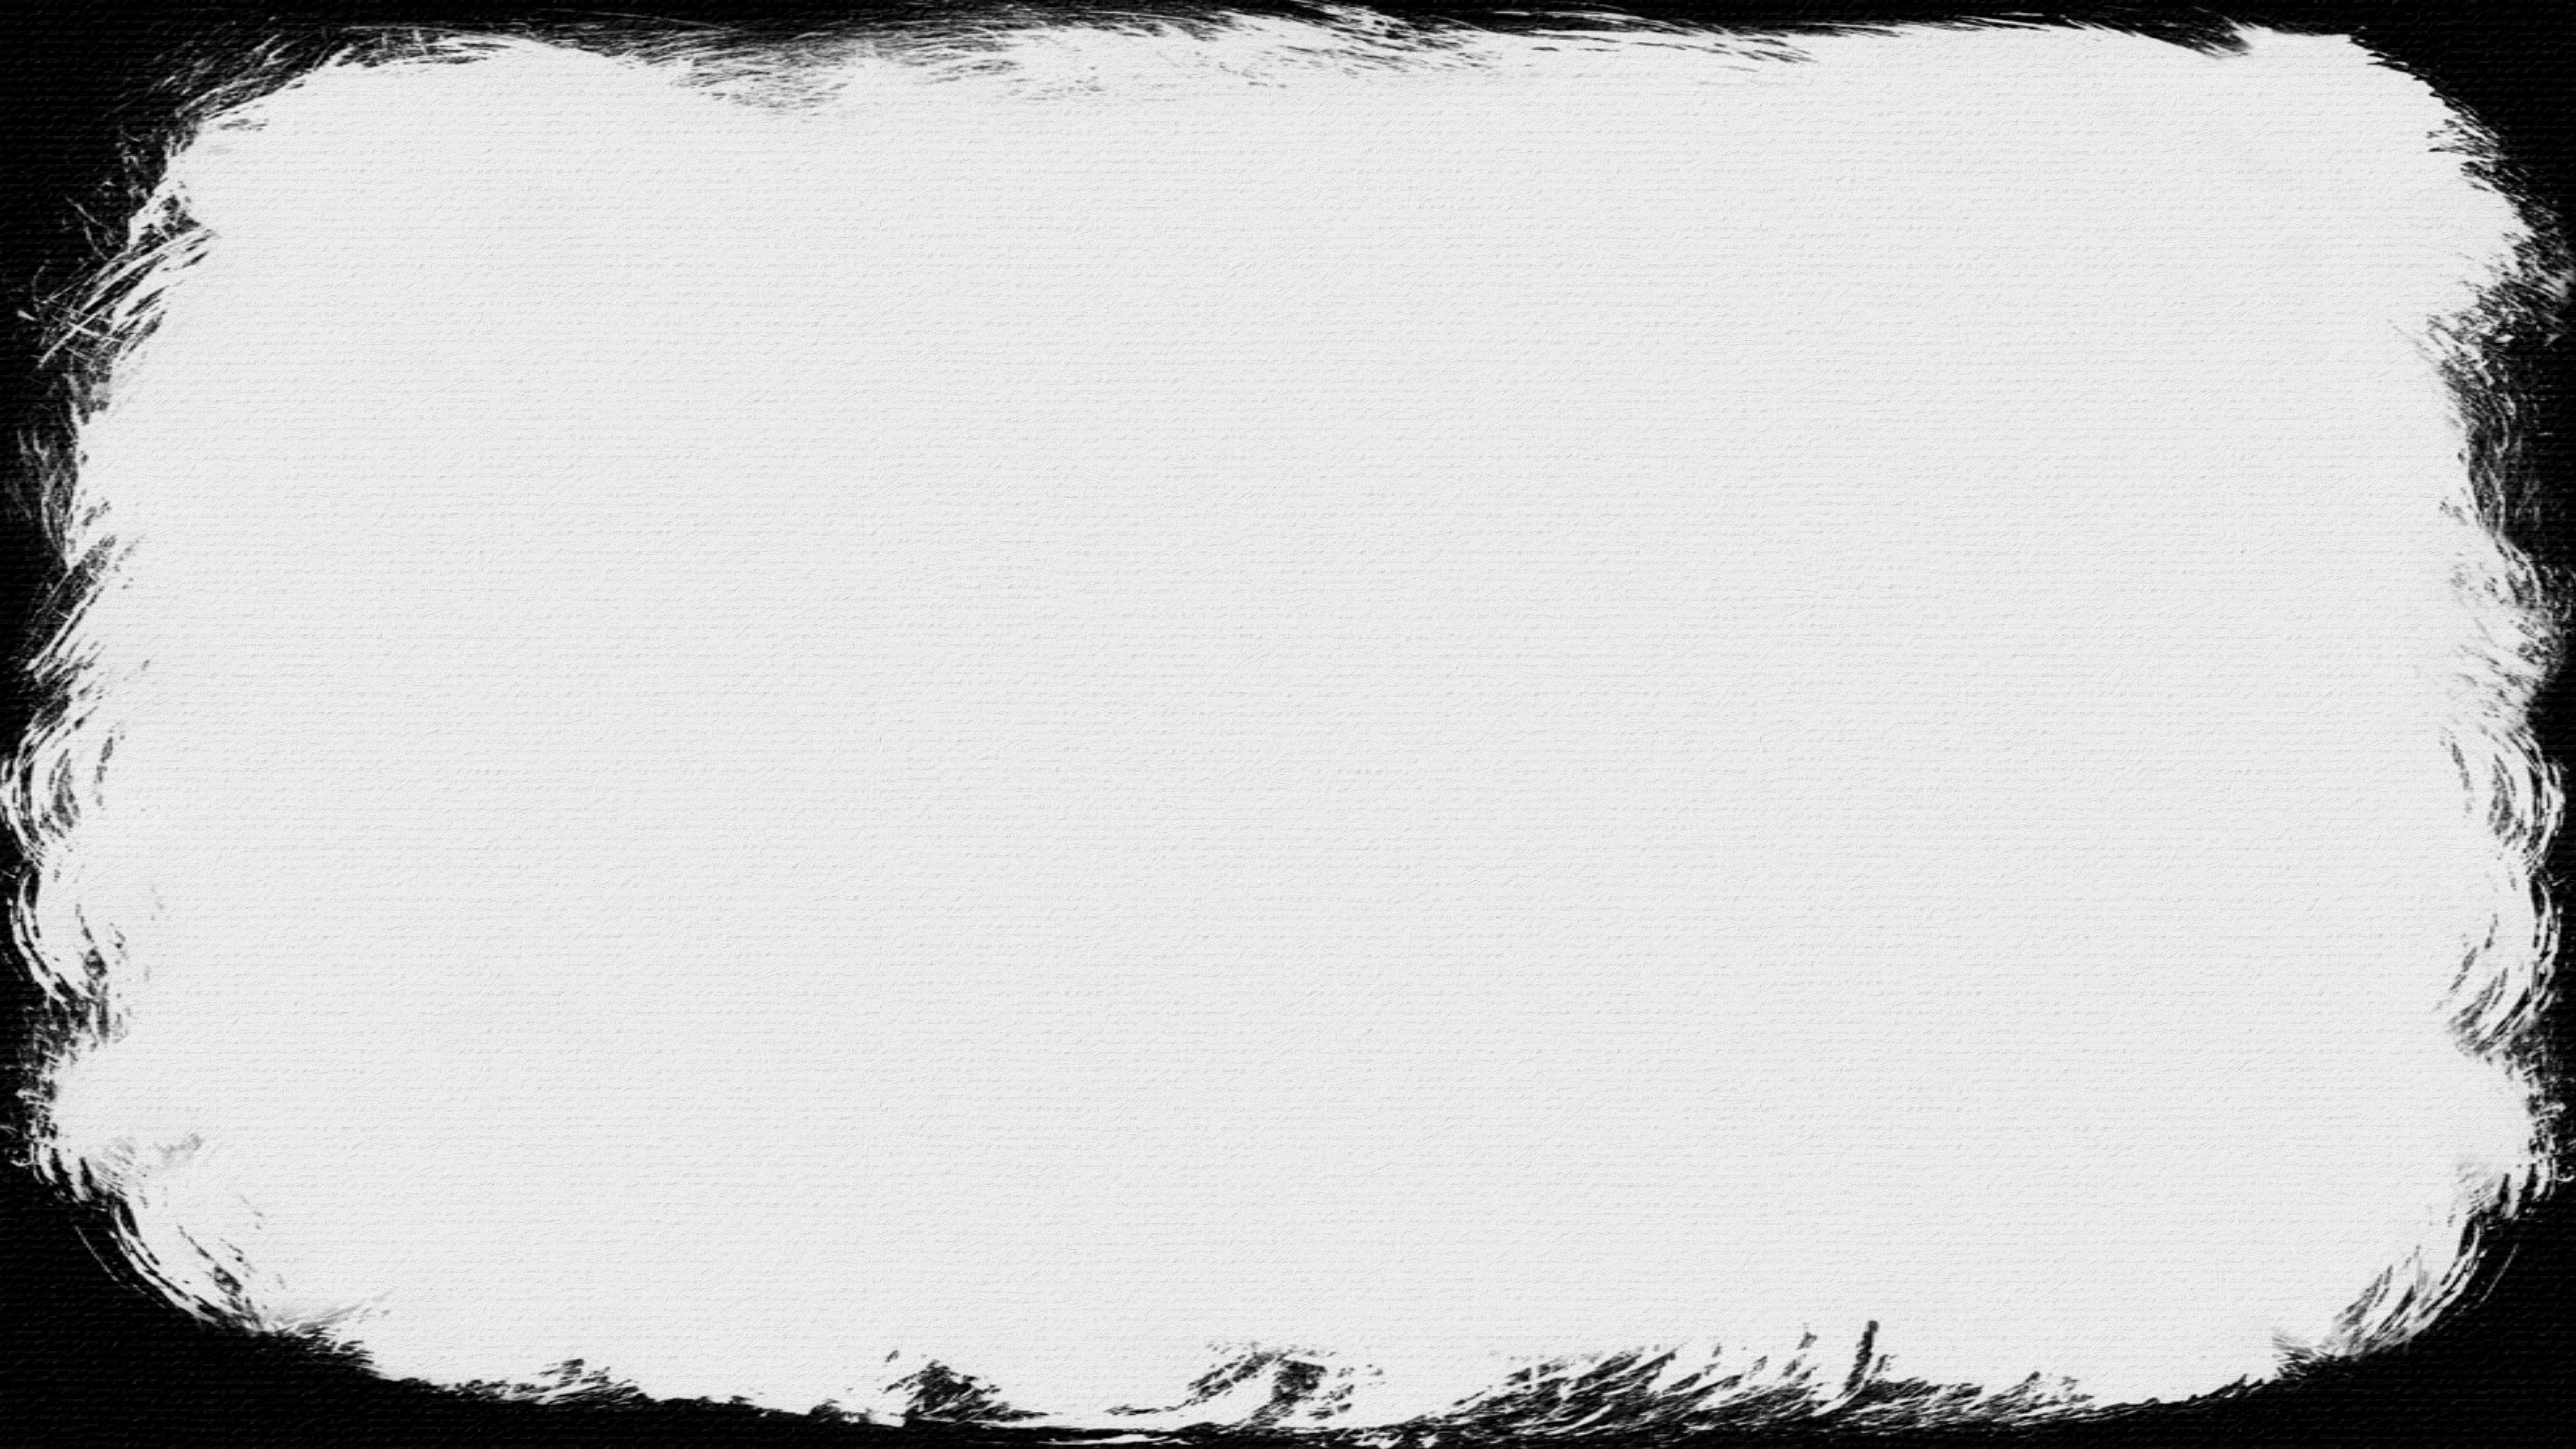 Grunge Border Frame Background Frame Background Background Graphic Image